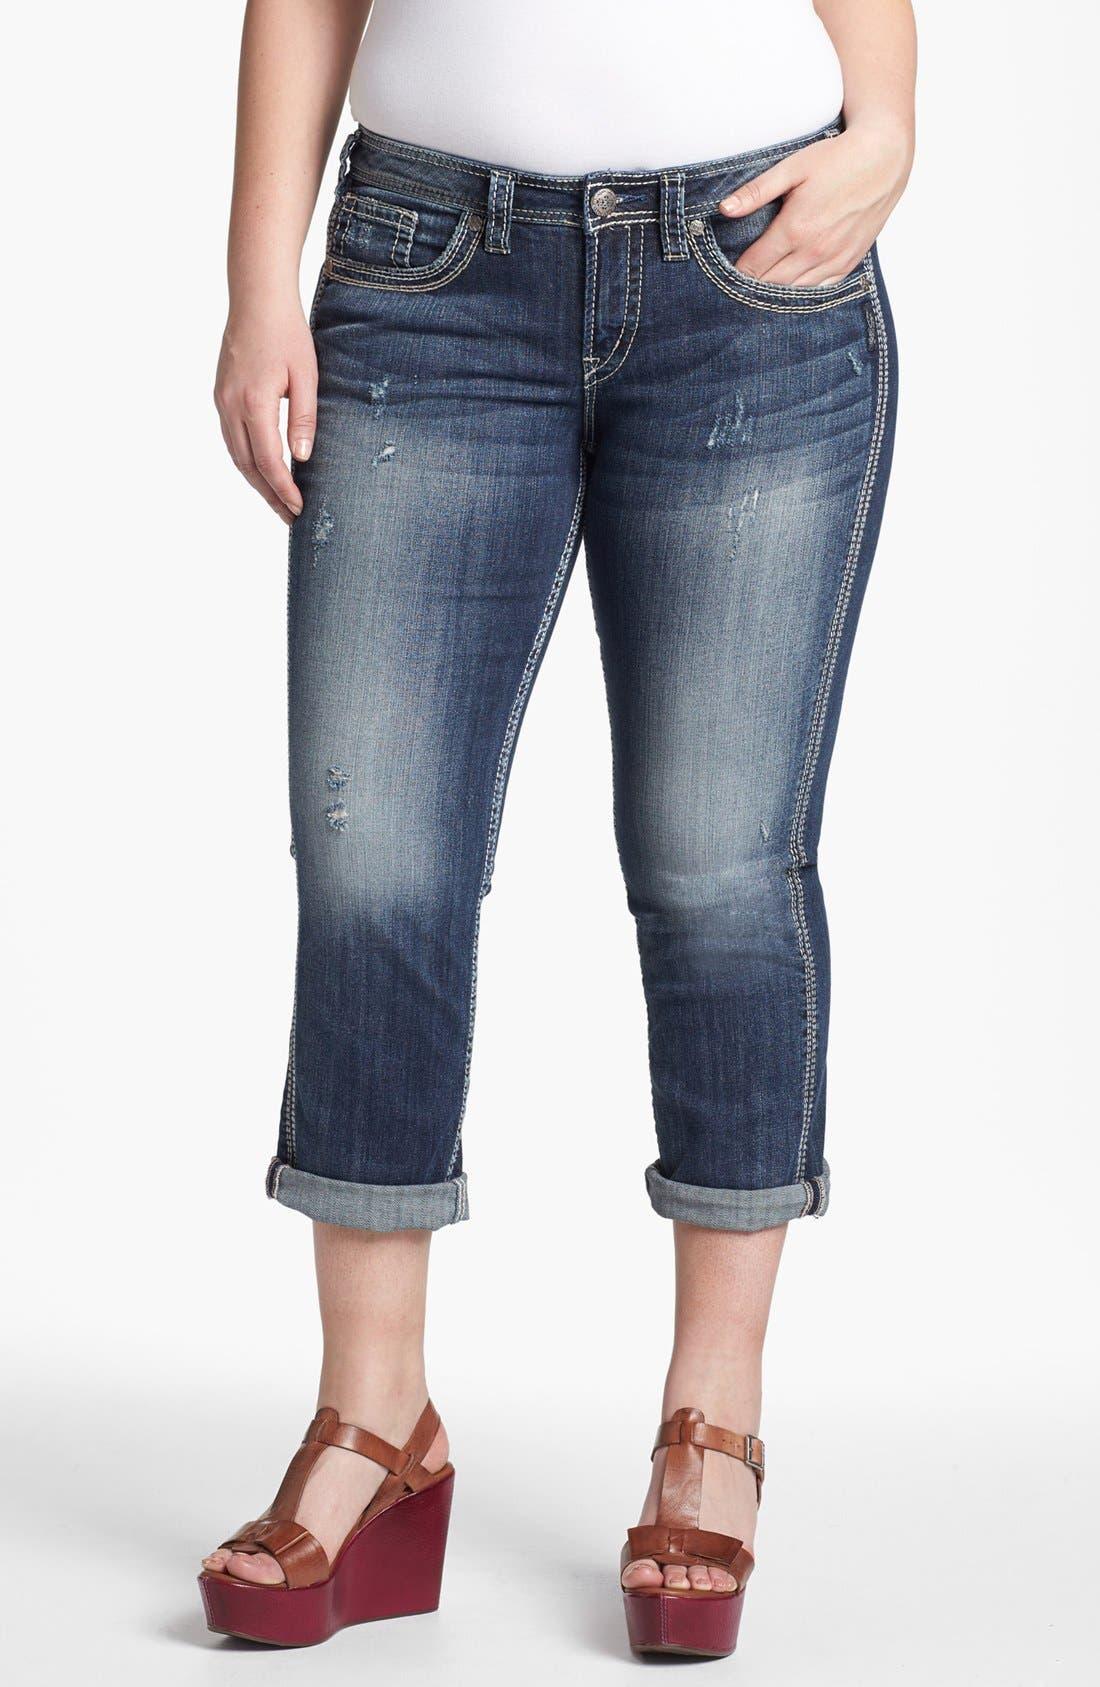 Main Image - Silver Jeans Co. 'Twisted' Cuff Capri Jeans (Juniors Plus)